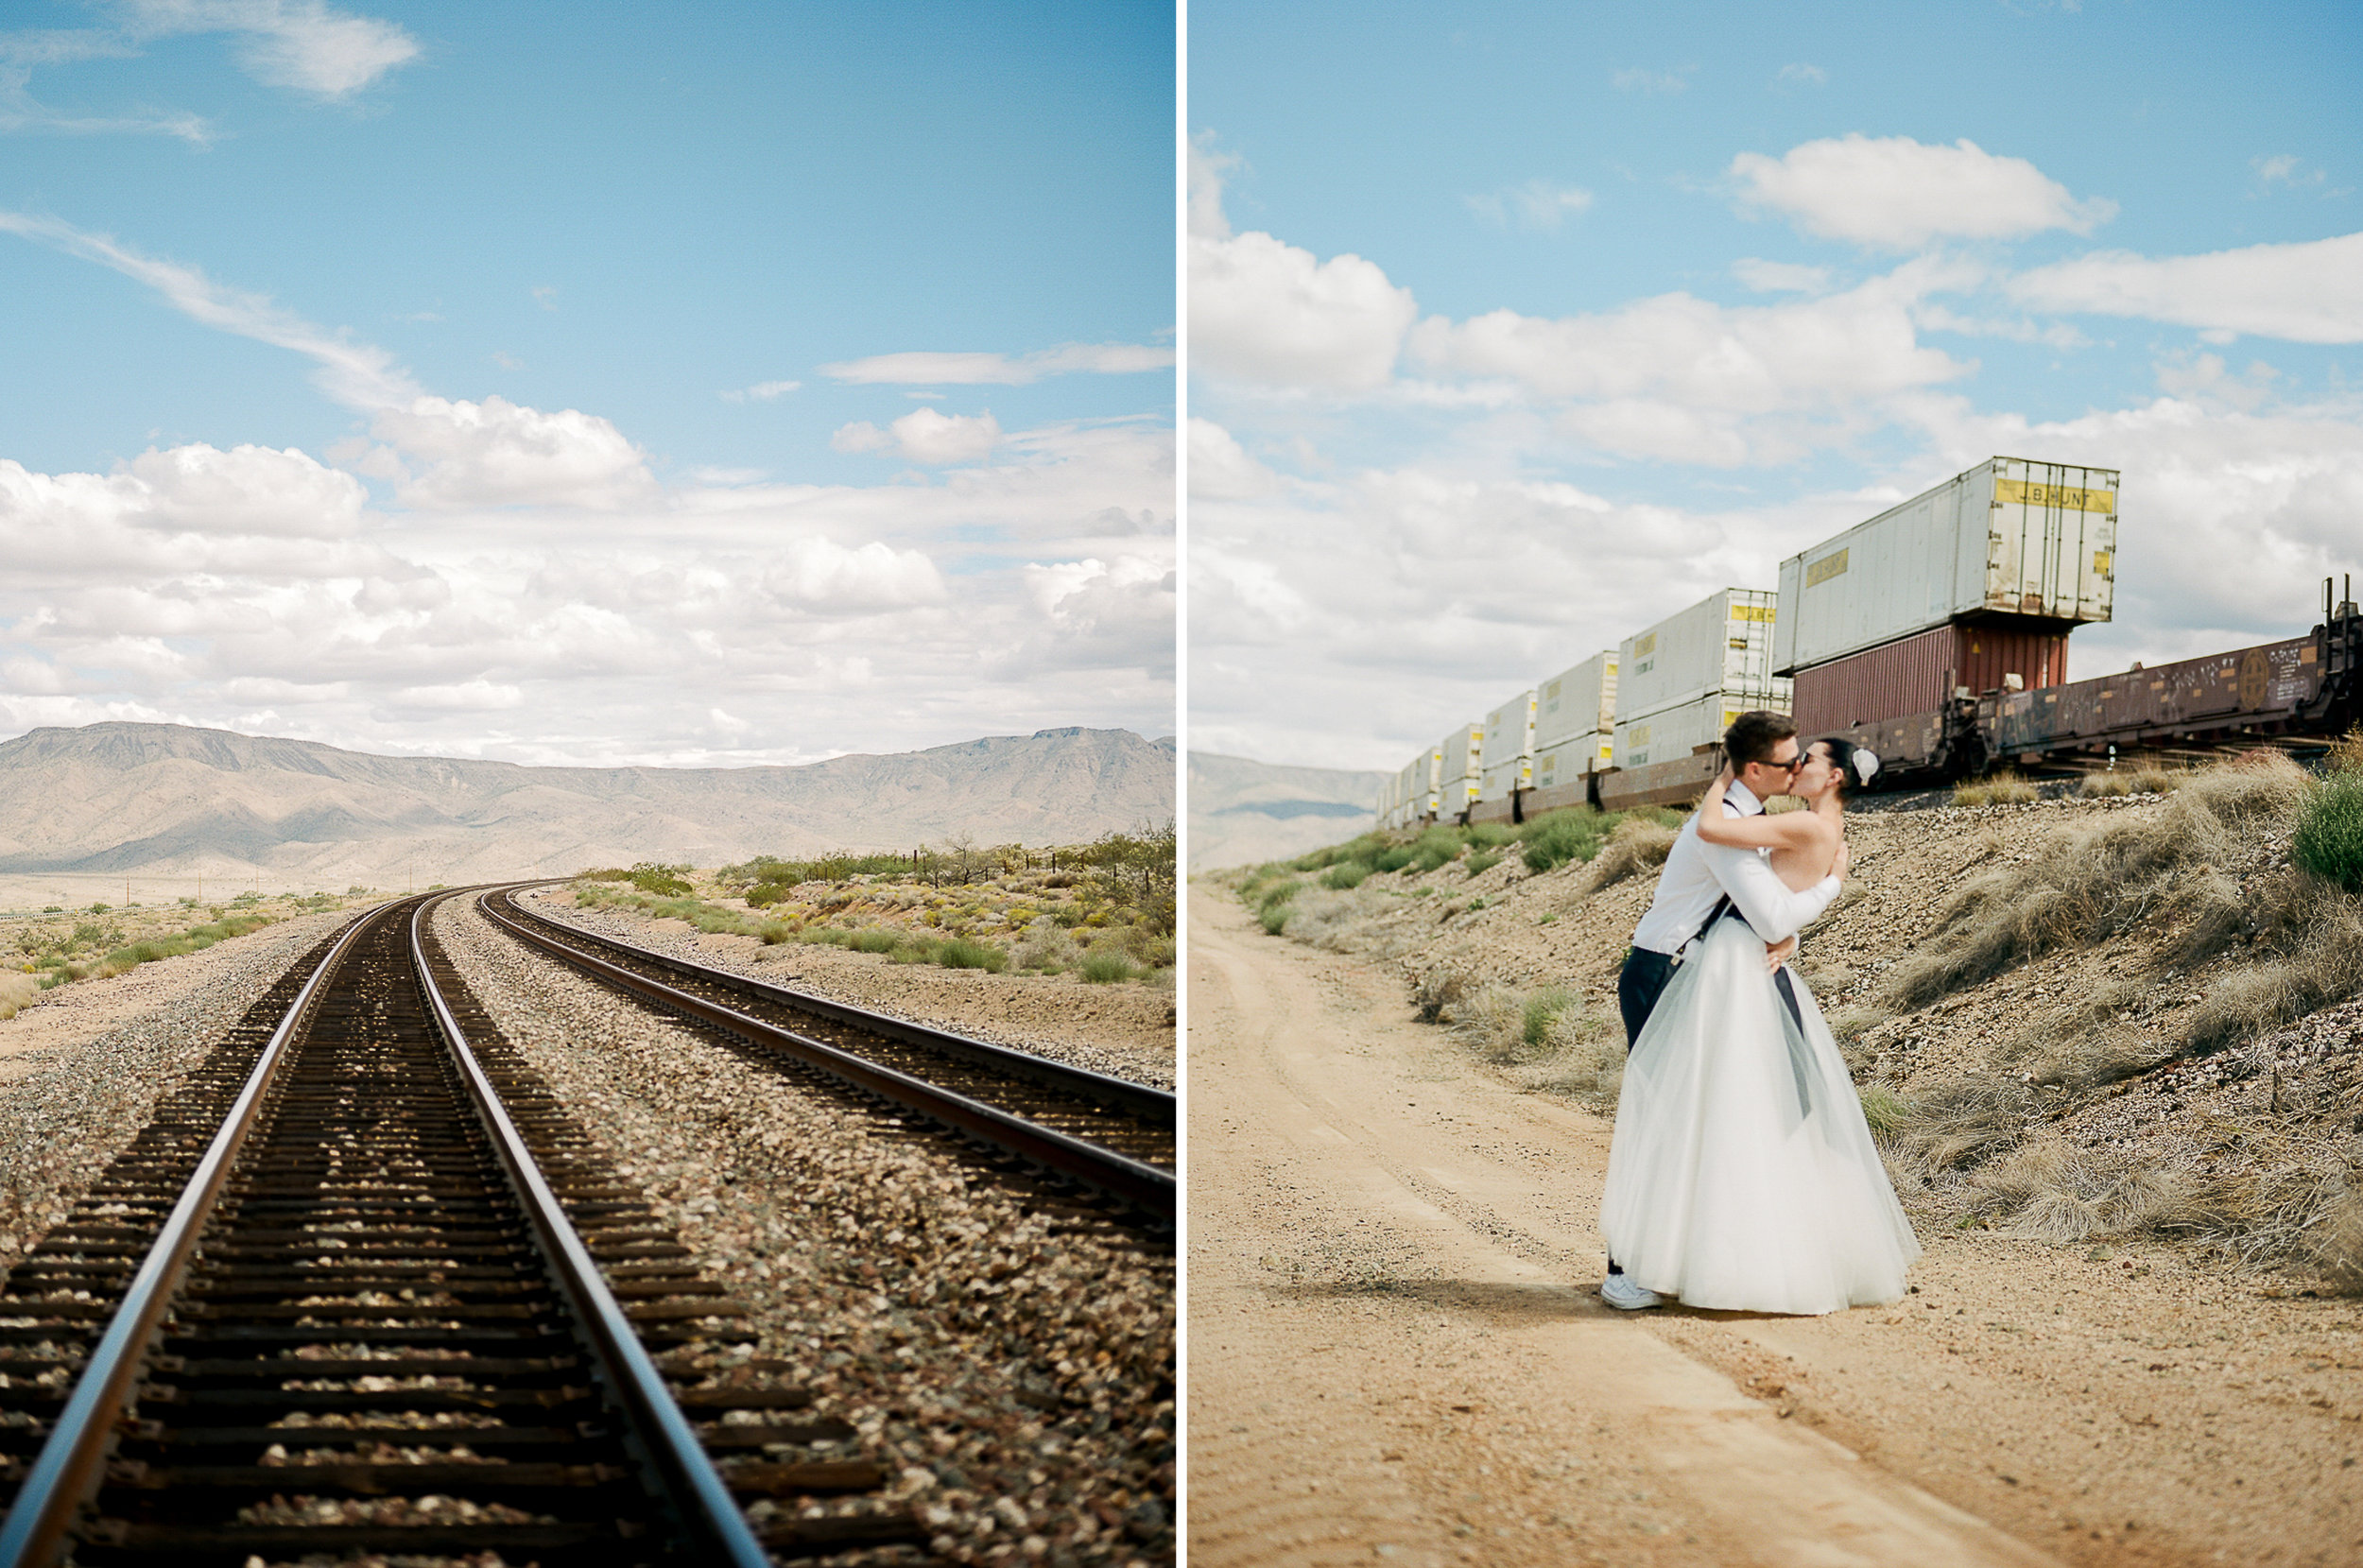 Susi-und-Danu-Hochzeit-Theresa-Pewal-Fotografie-fine-art-5-06.jpg